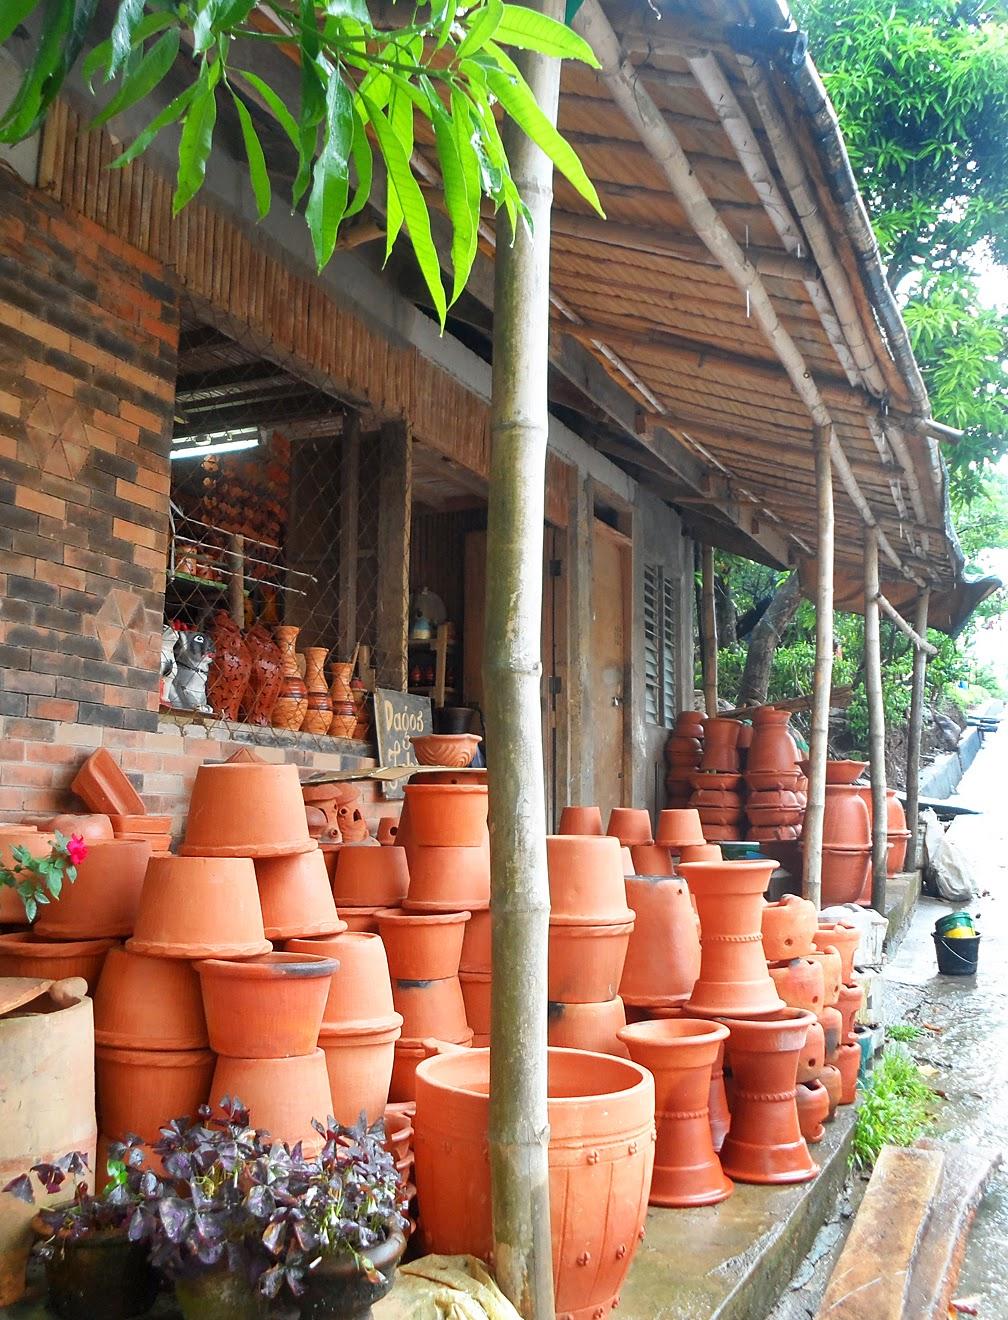 tiwi's philceramics: bicol region's center for earthenware